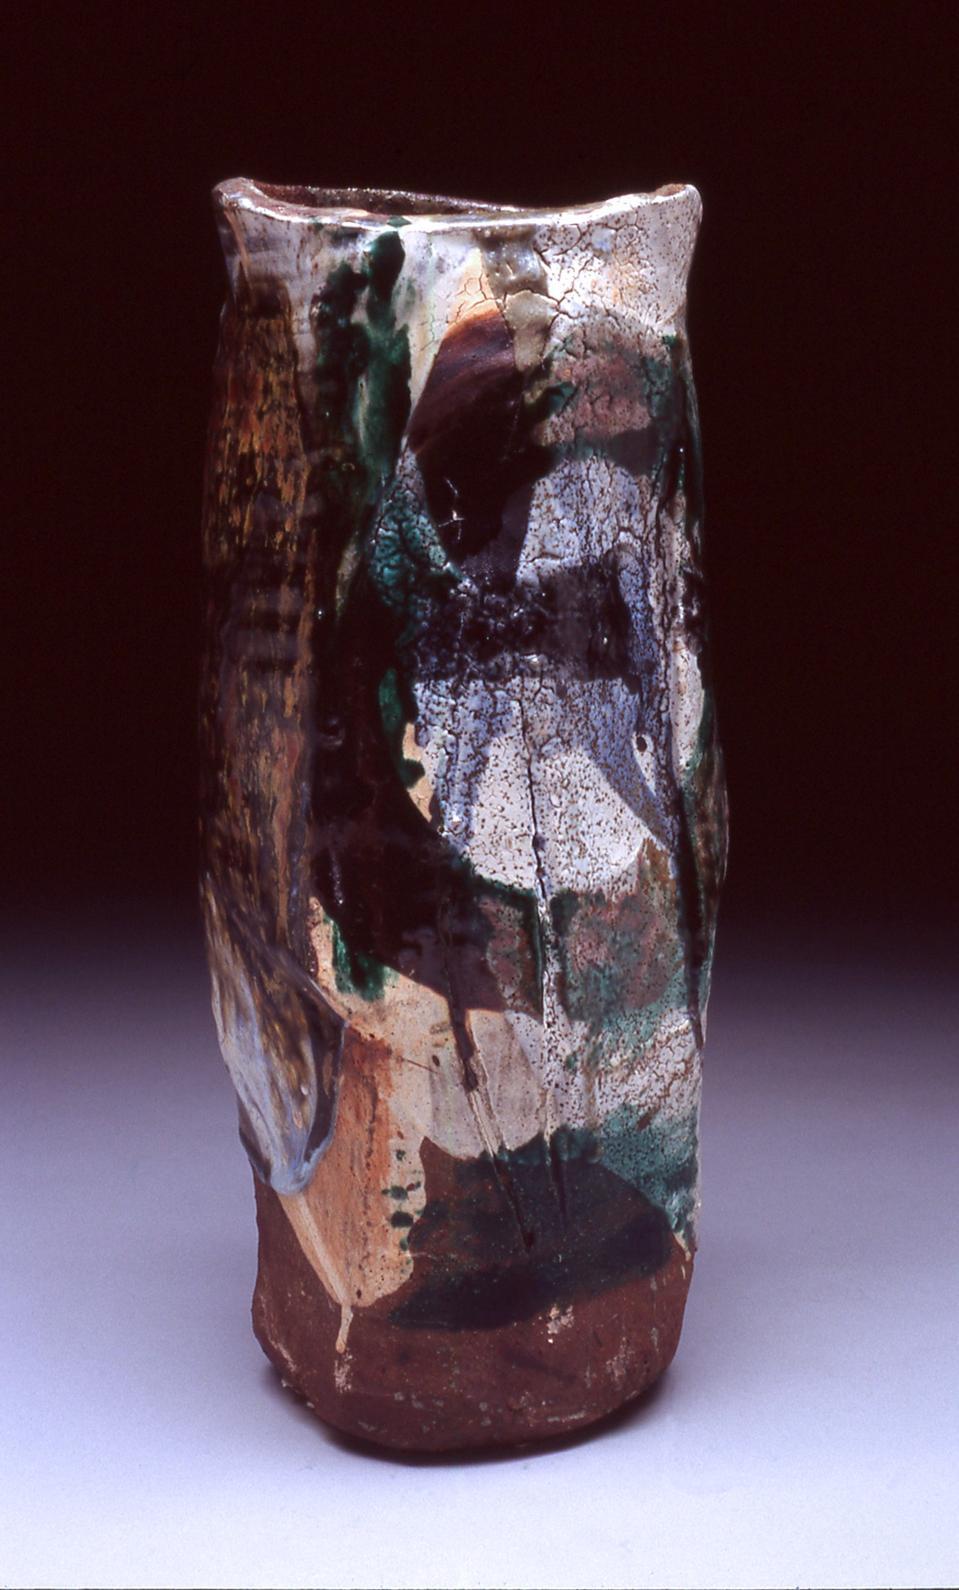 Peter Voulkos (1924-2002), vase. Stoneware, glaze, 1959, Missoula Art Museum Collection, donated by Maxine M. Blackmer, 2003.03.17.